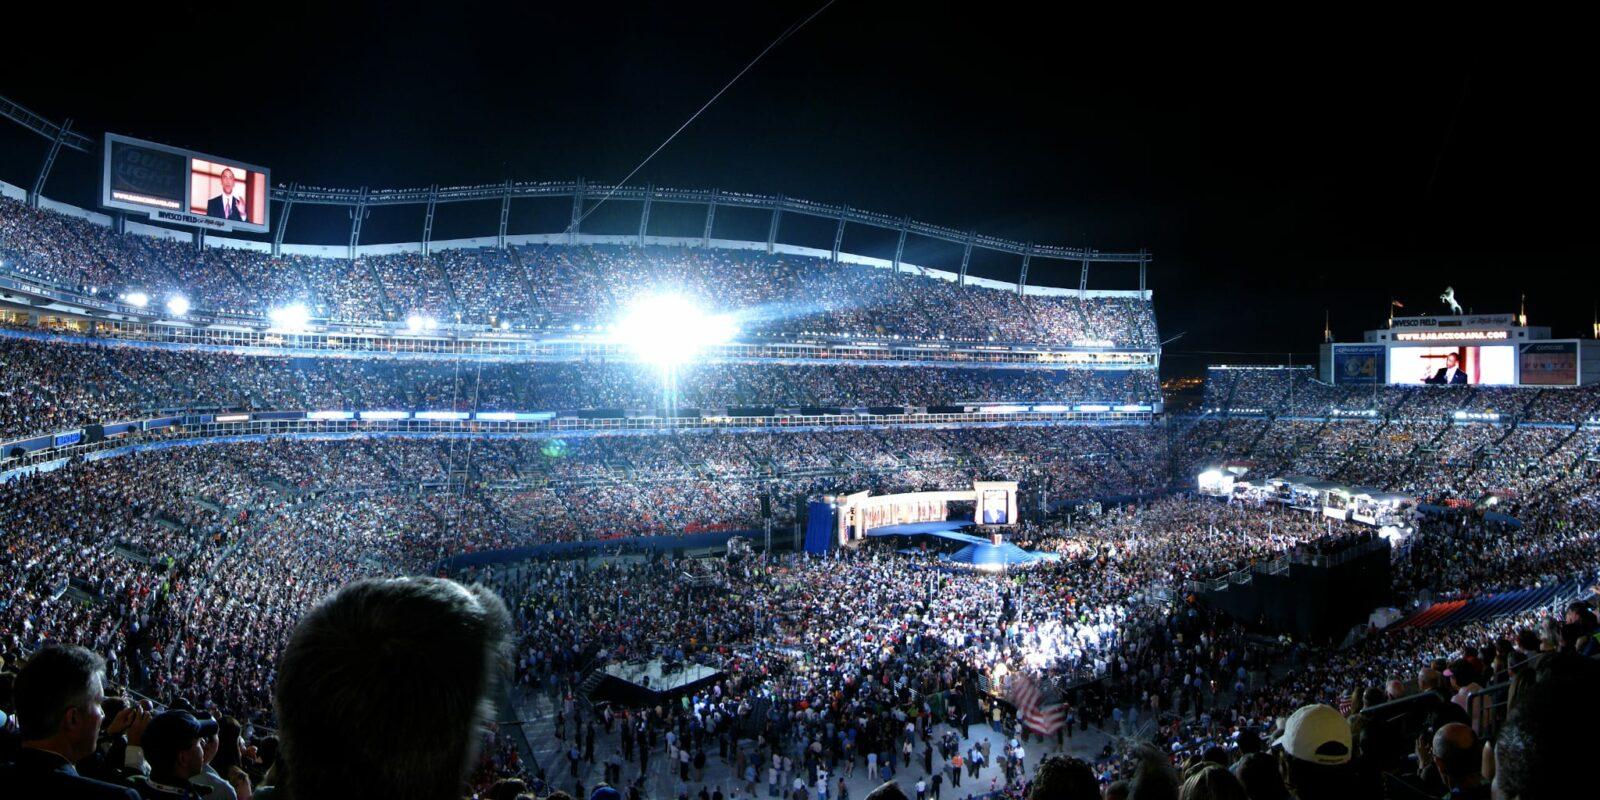 Democratic National Convention 2008 Obama Speech Mile High Stadium